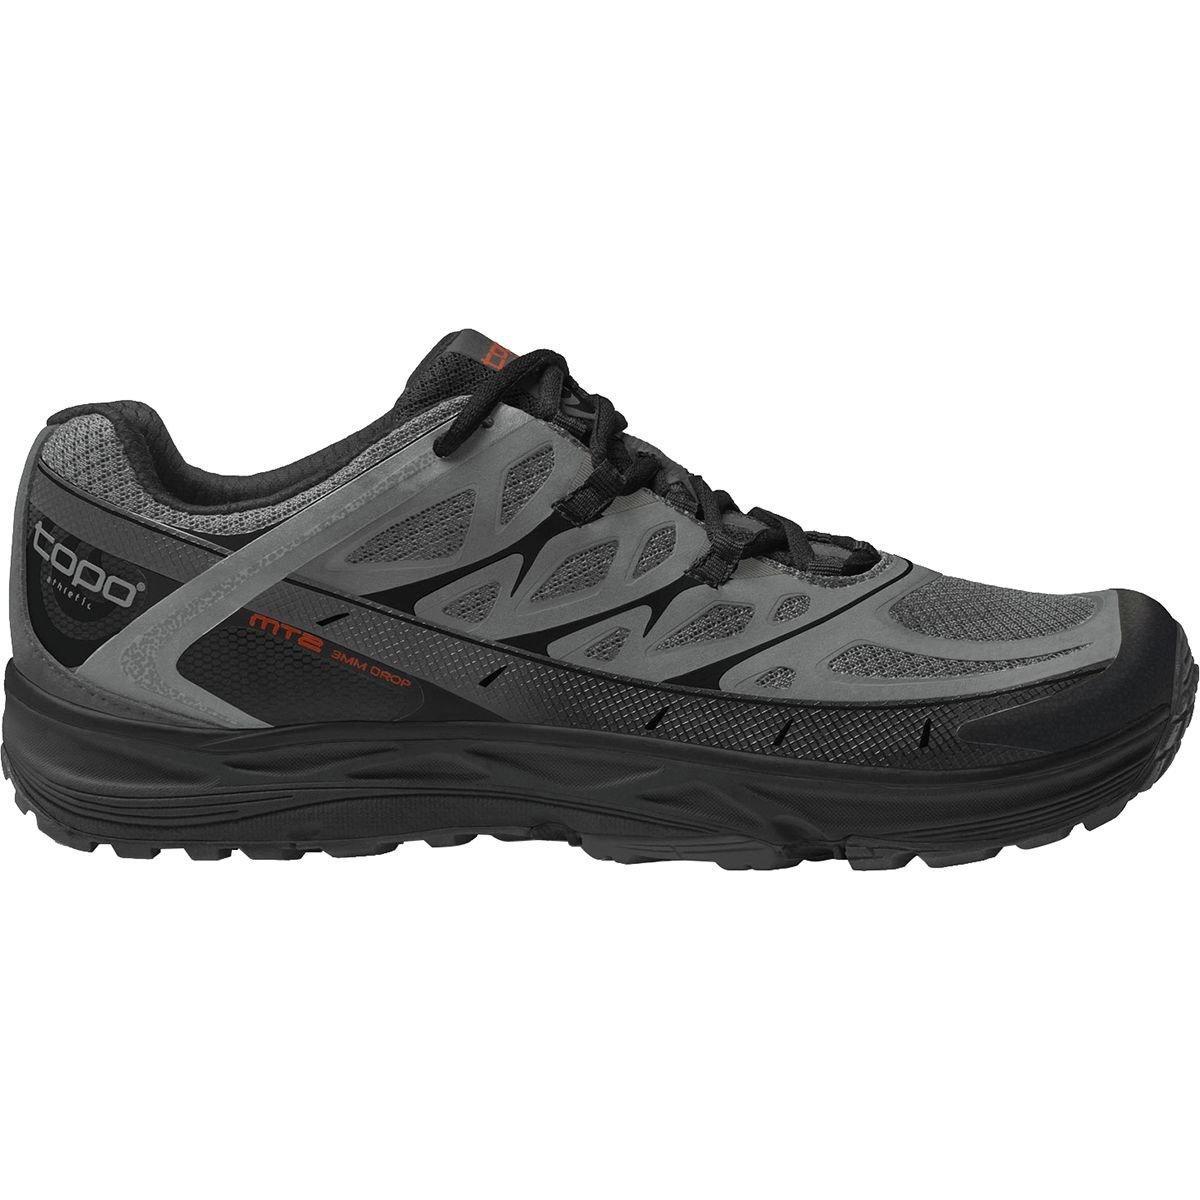 Topo Athletic mt2 Running Shoe – Men 's B07CGFP6KW